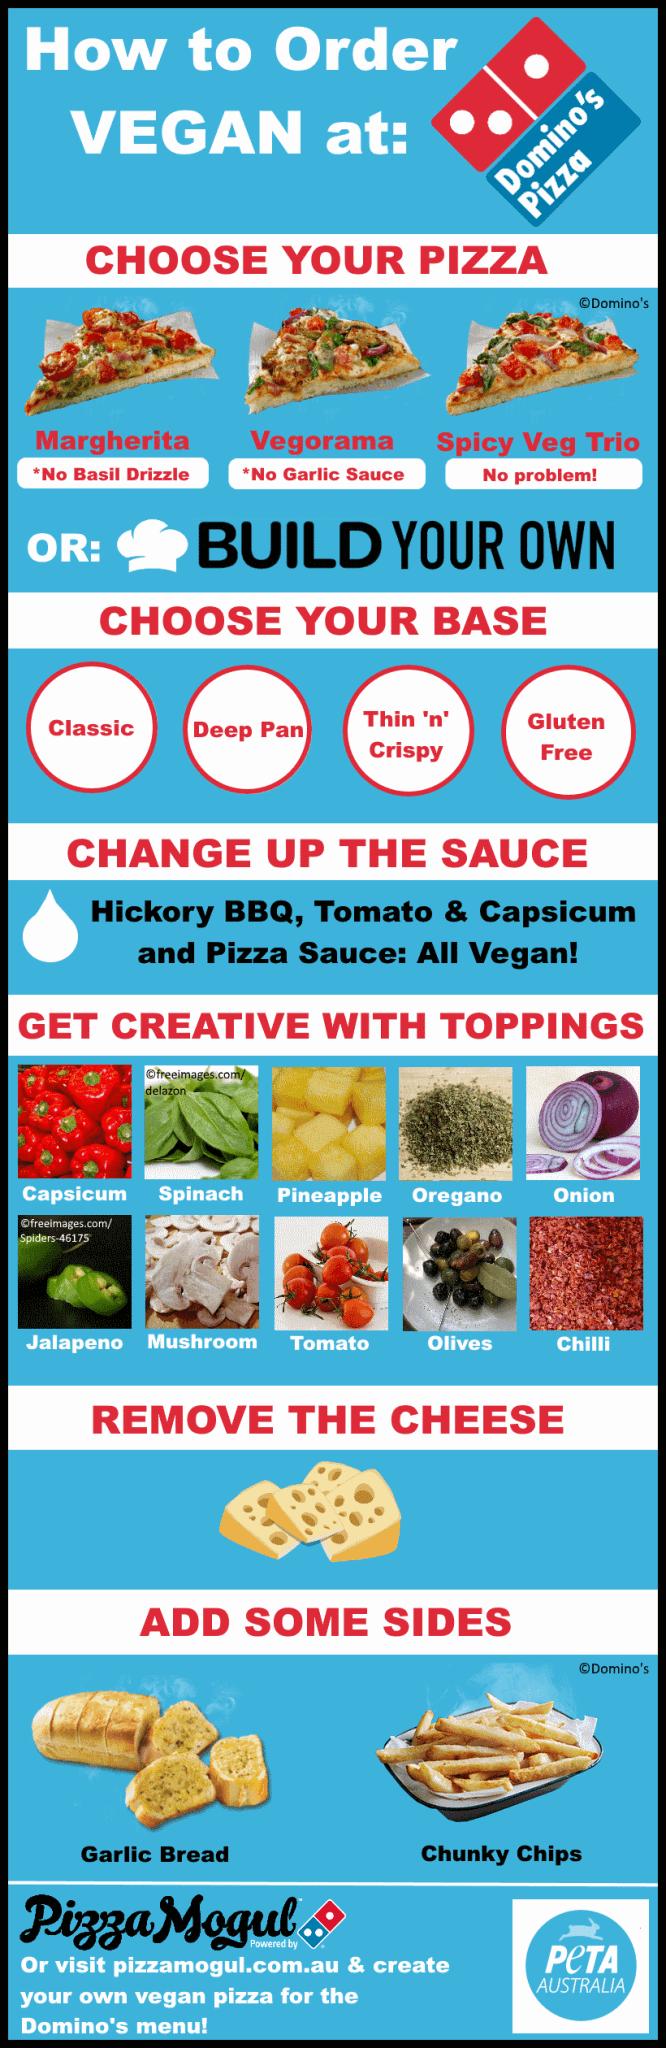 How to Order Vegan at Domino's Australia Infographic - PETA Australia